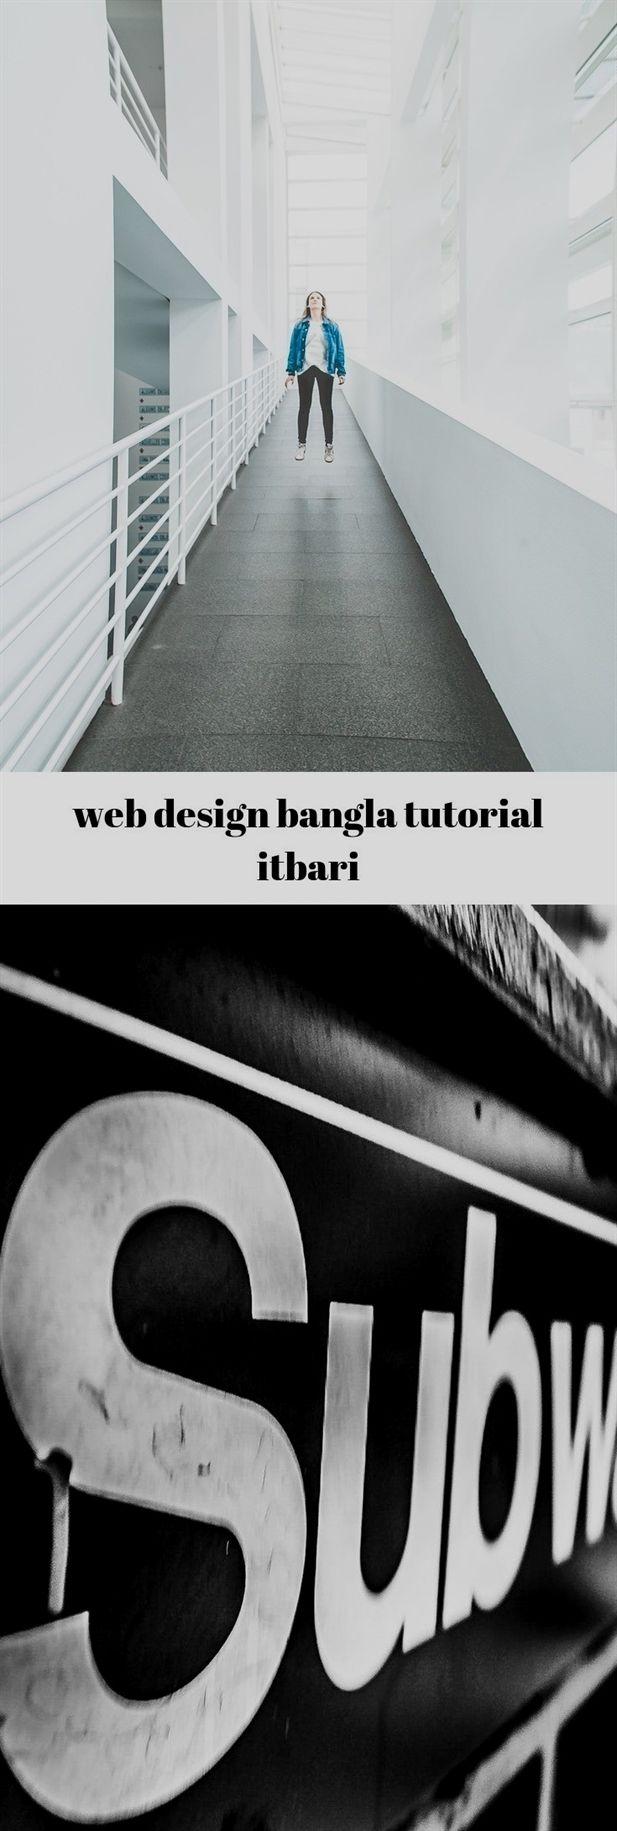 Pdf html code tutorial